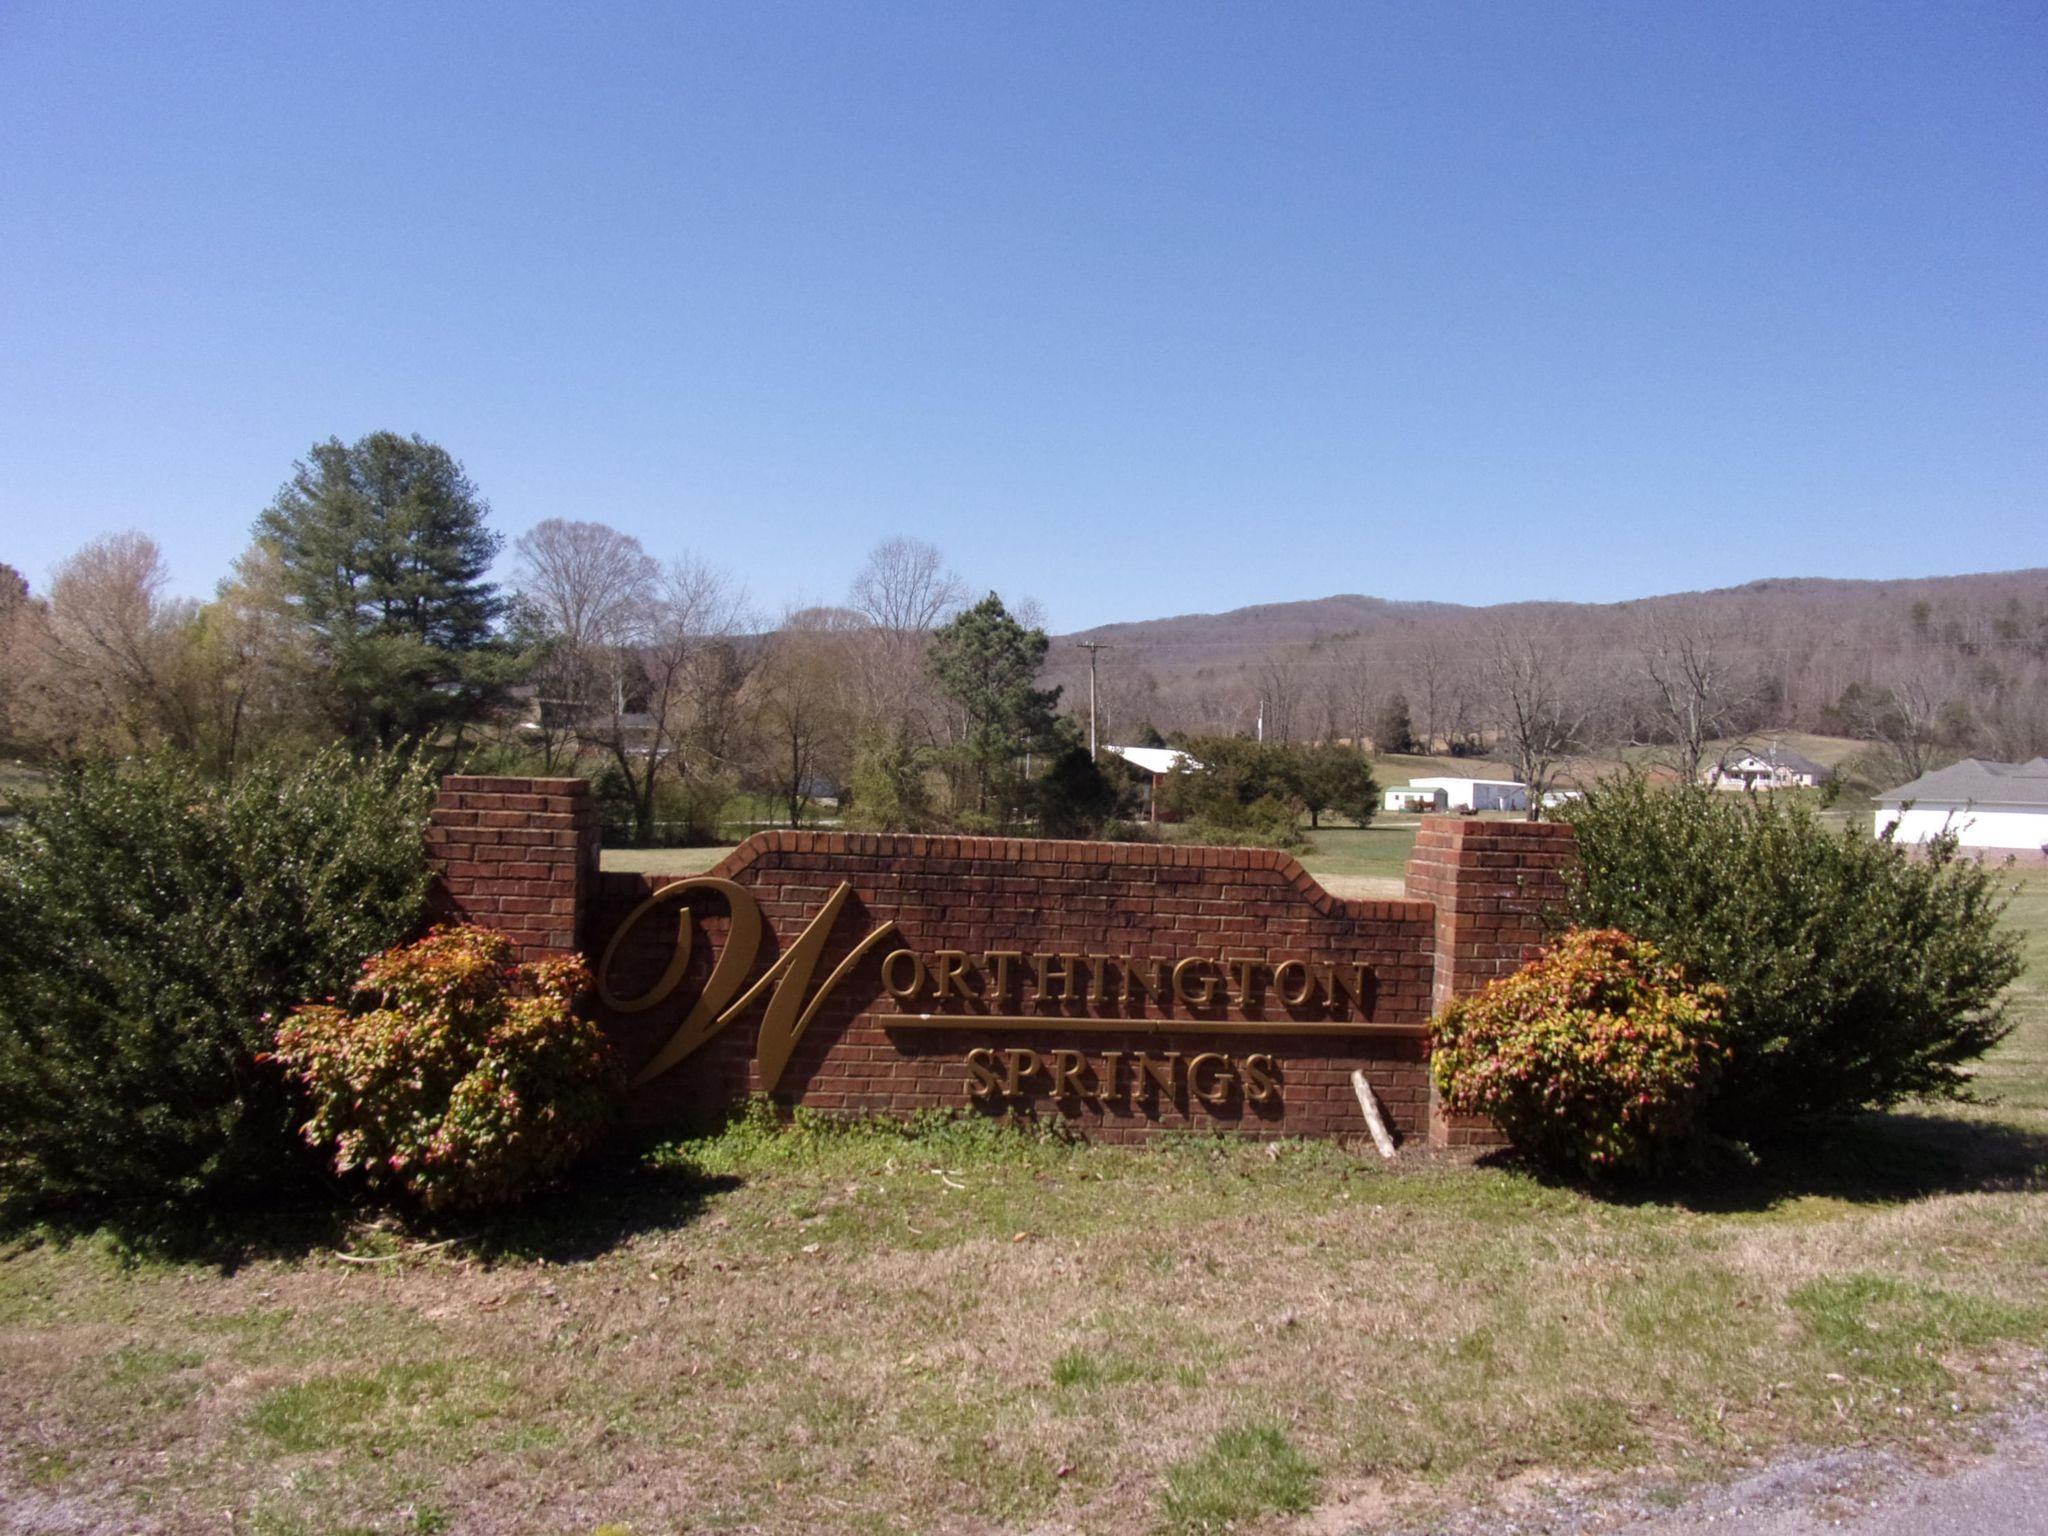 Worthington Springs Dr #4, Pikeville, TN 37367 - Lot/Land - MLS #1296692 -  22 Photos | Trulia